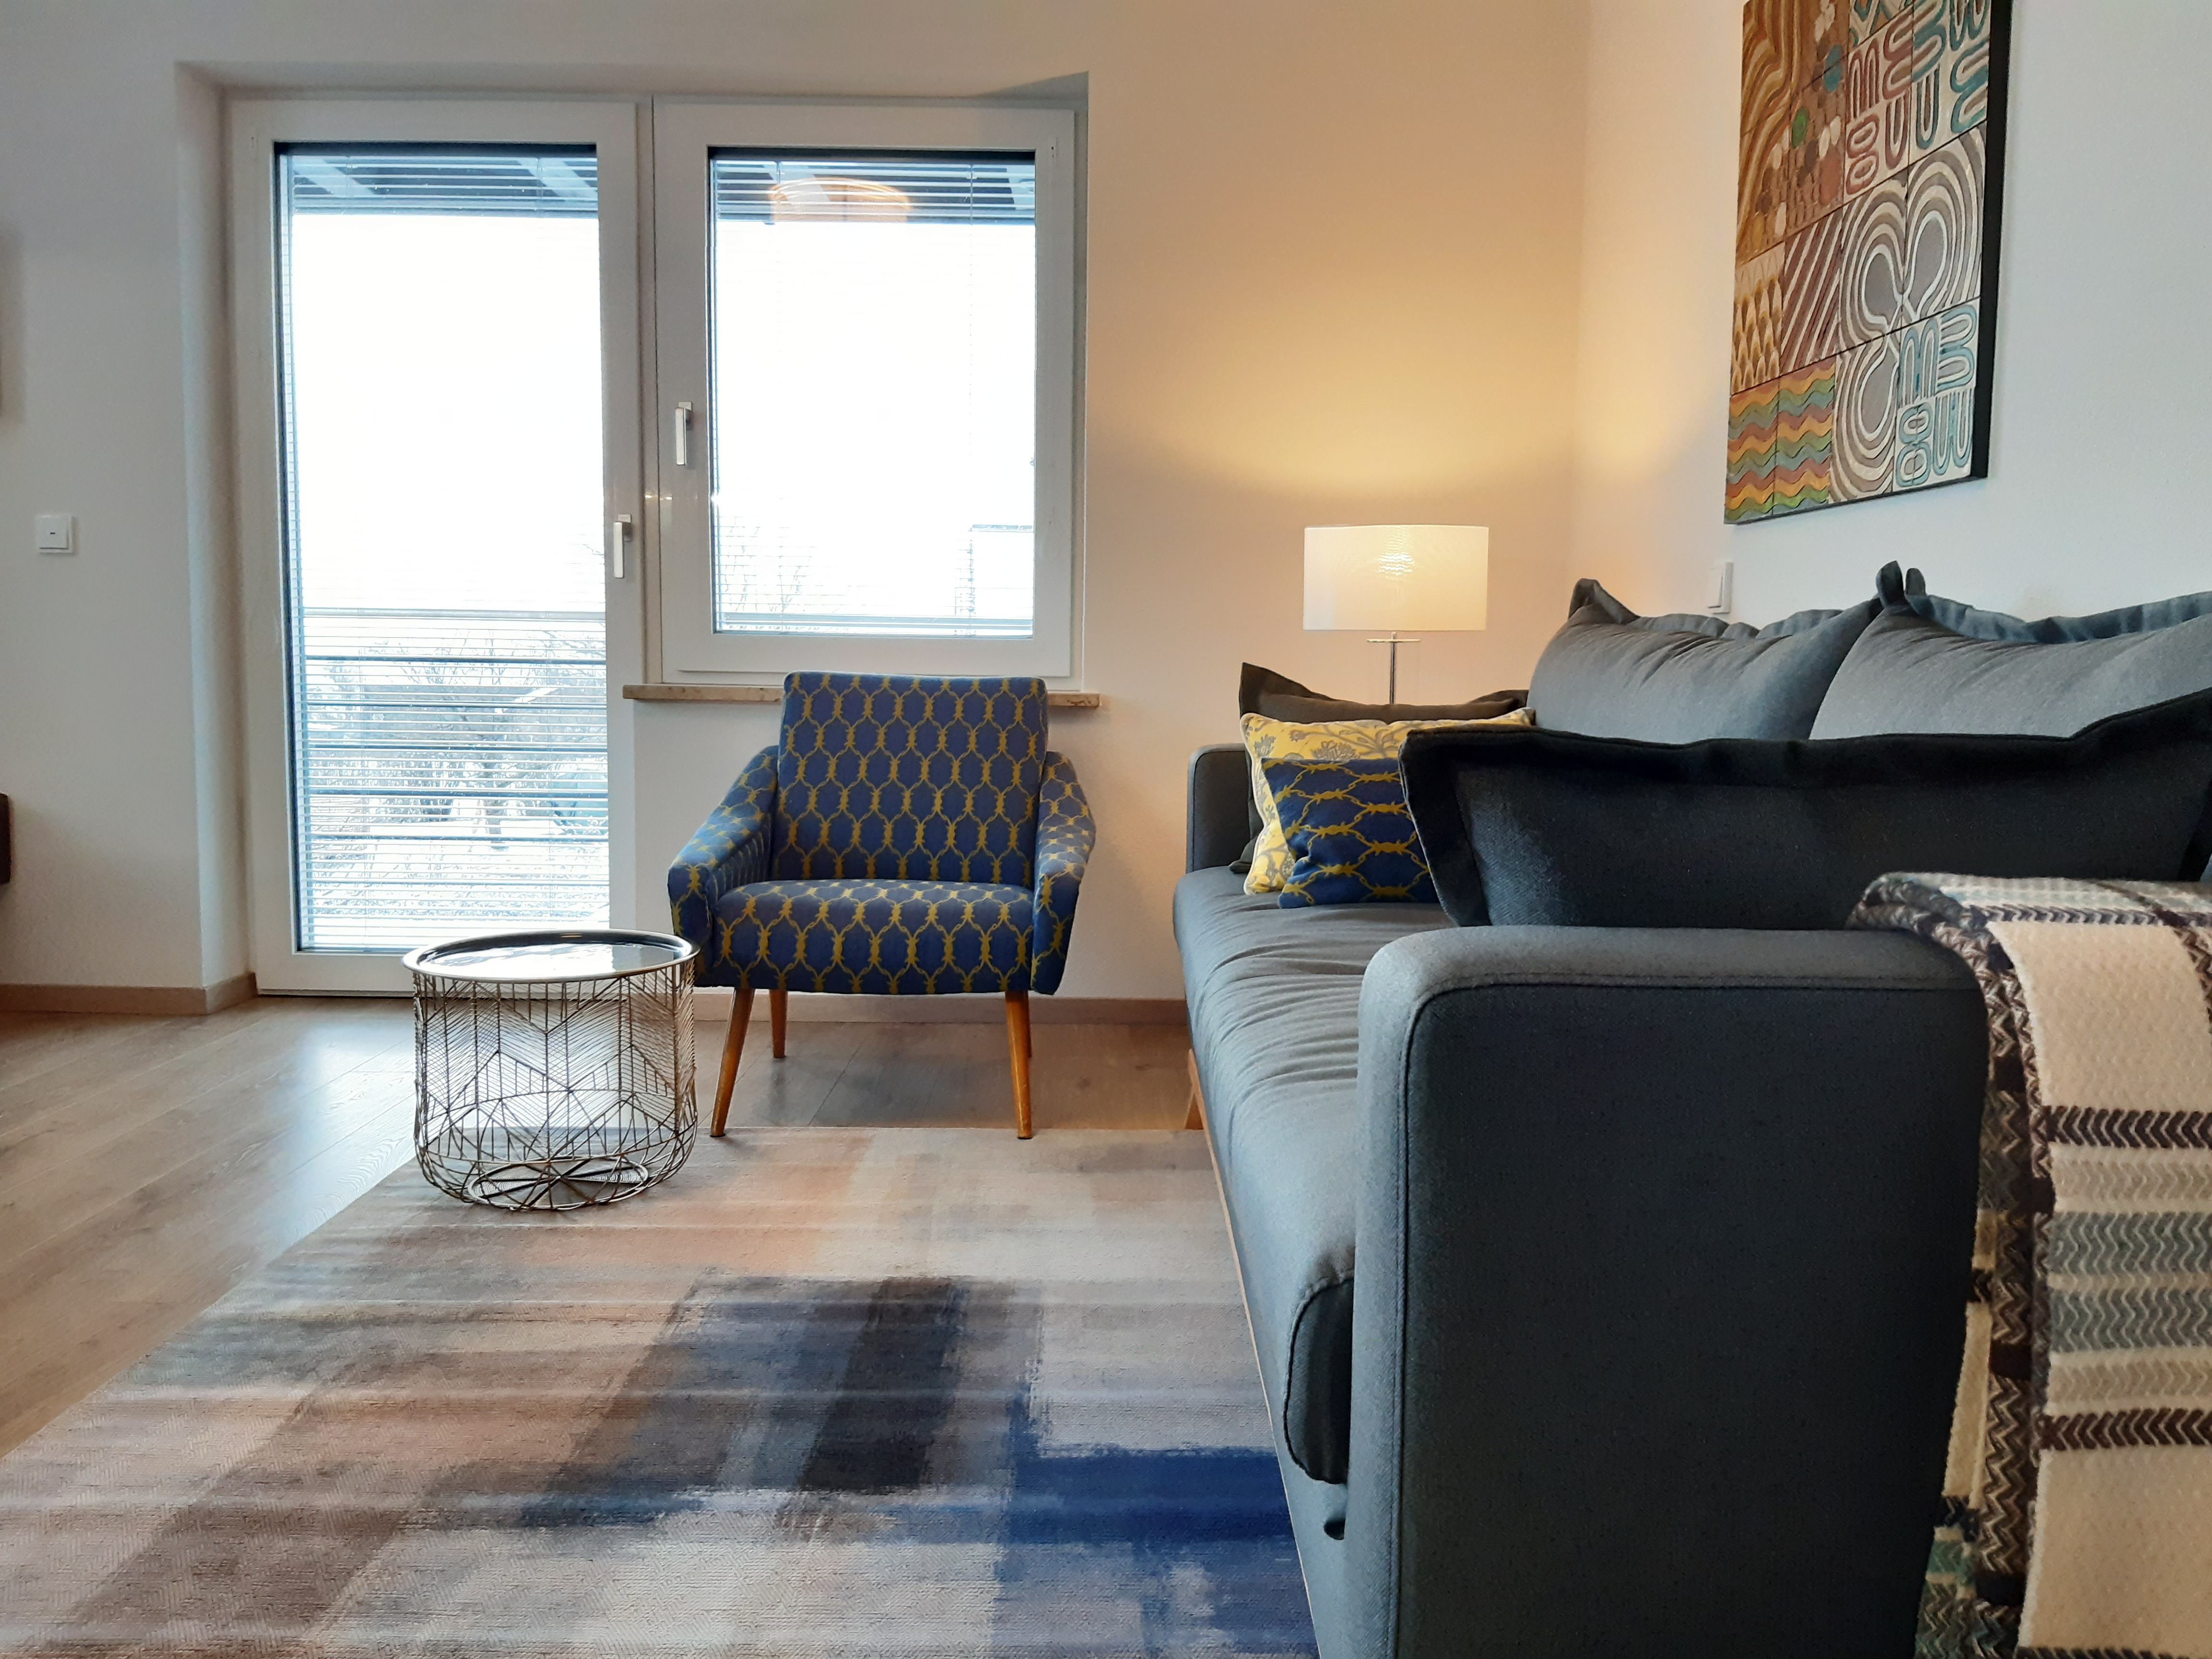 decoration-interior-alexs-varjao-decorator-germany-spain-holiday-apartments-boutique-famous-Castle-Bavarian-King-Ludwig-Schloss-Neuschwanstein-Füssen-blue-design-carpet-cozy-armchair